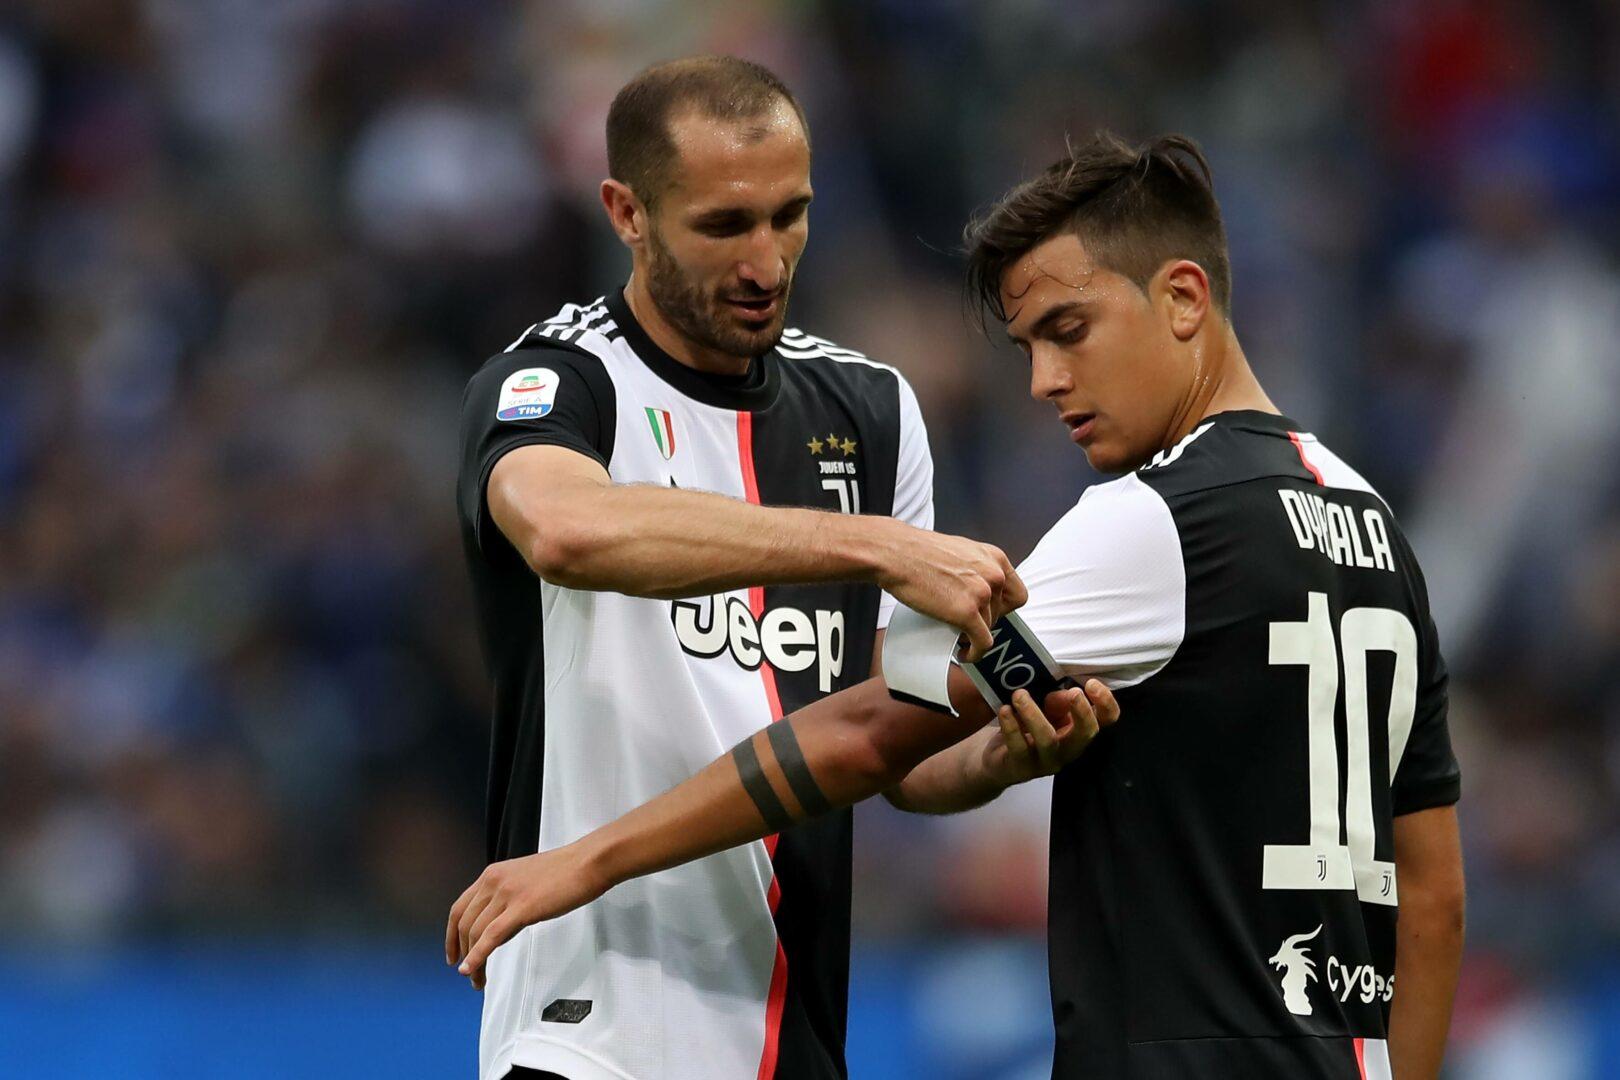 Giorgio Chiellini übergibt die Kapitänsbinde an Paulo Dybala.